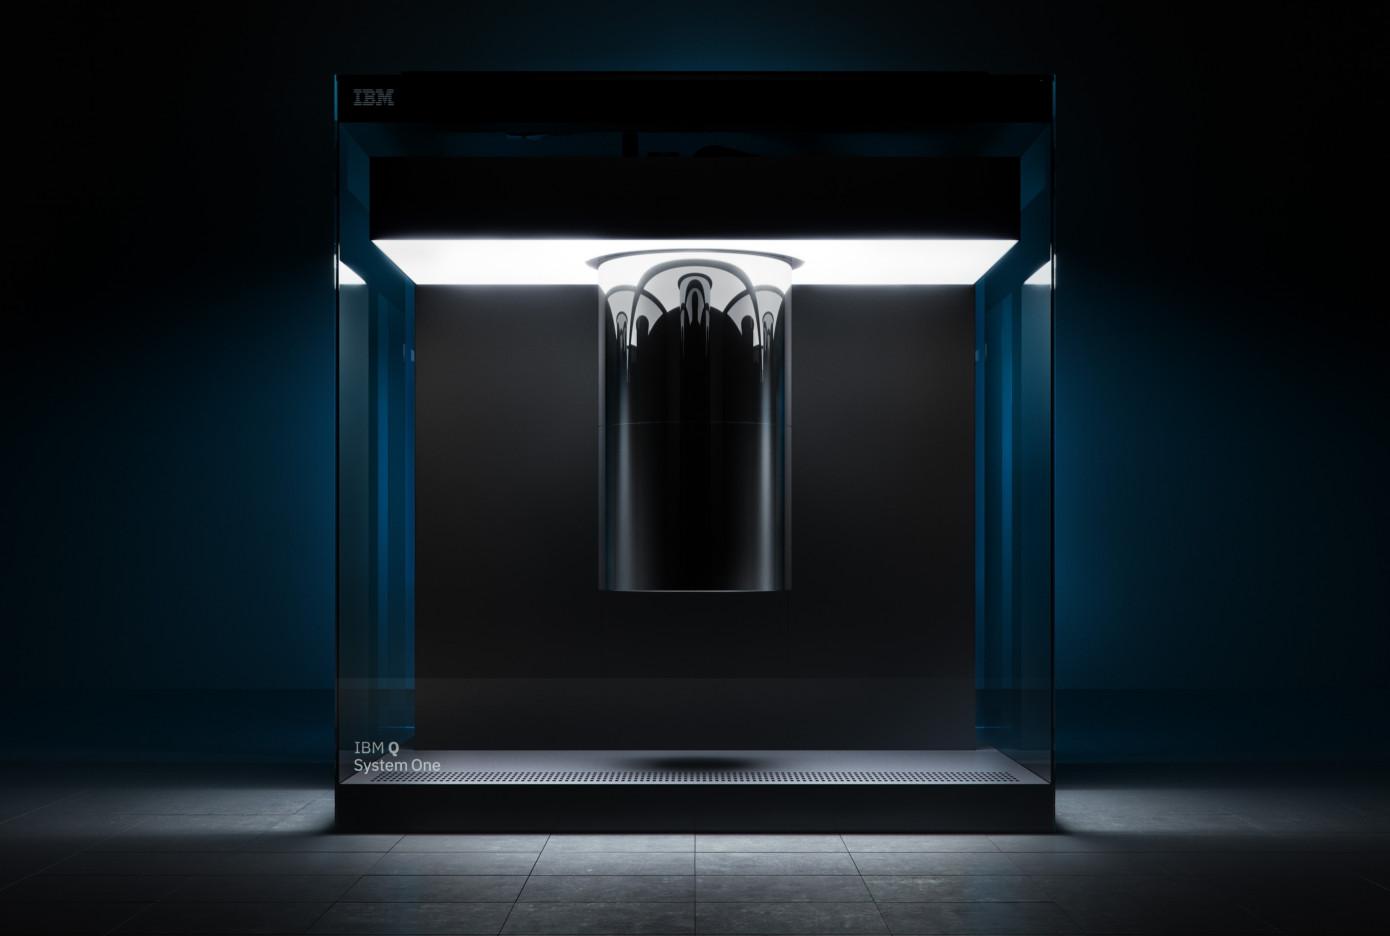 ibm q-system-one